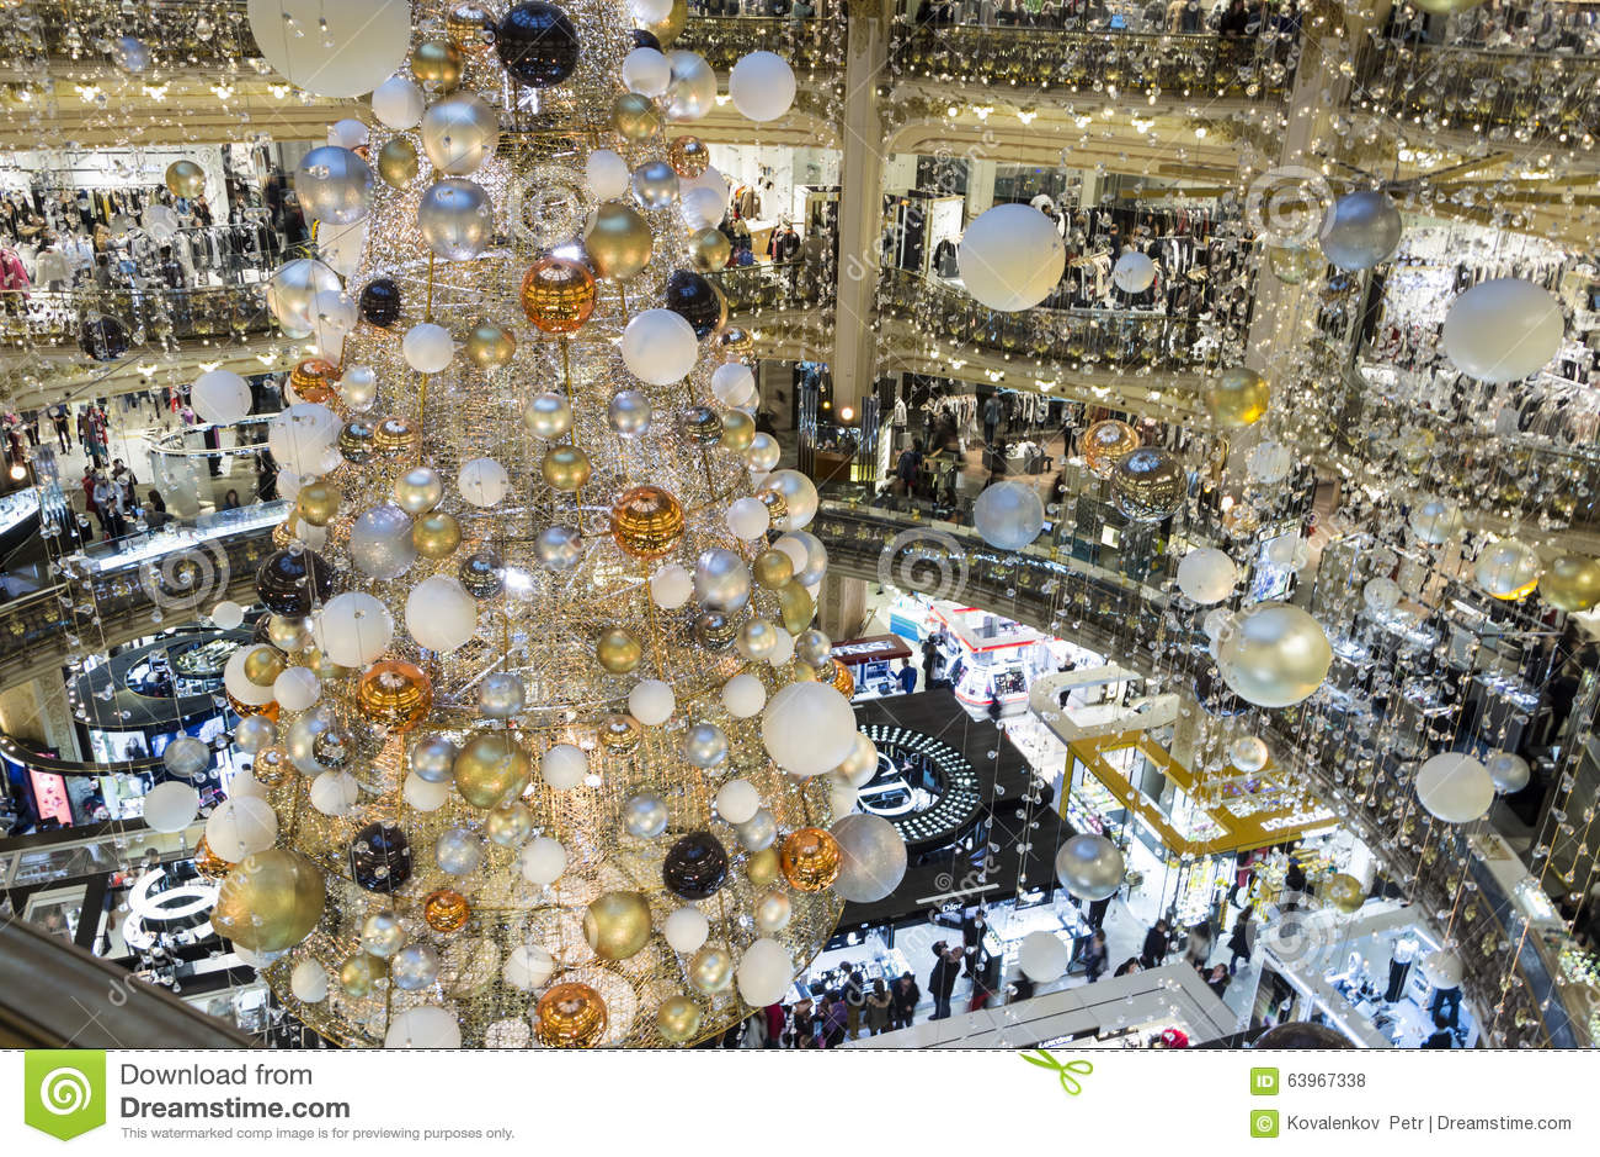 Decorations noel galeries lafayette